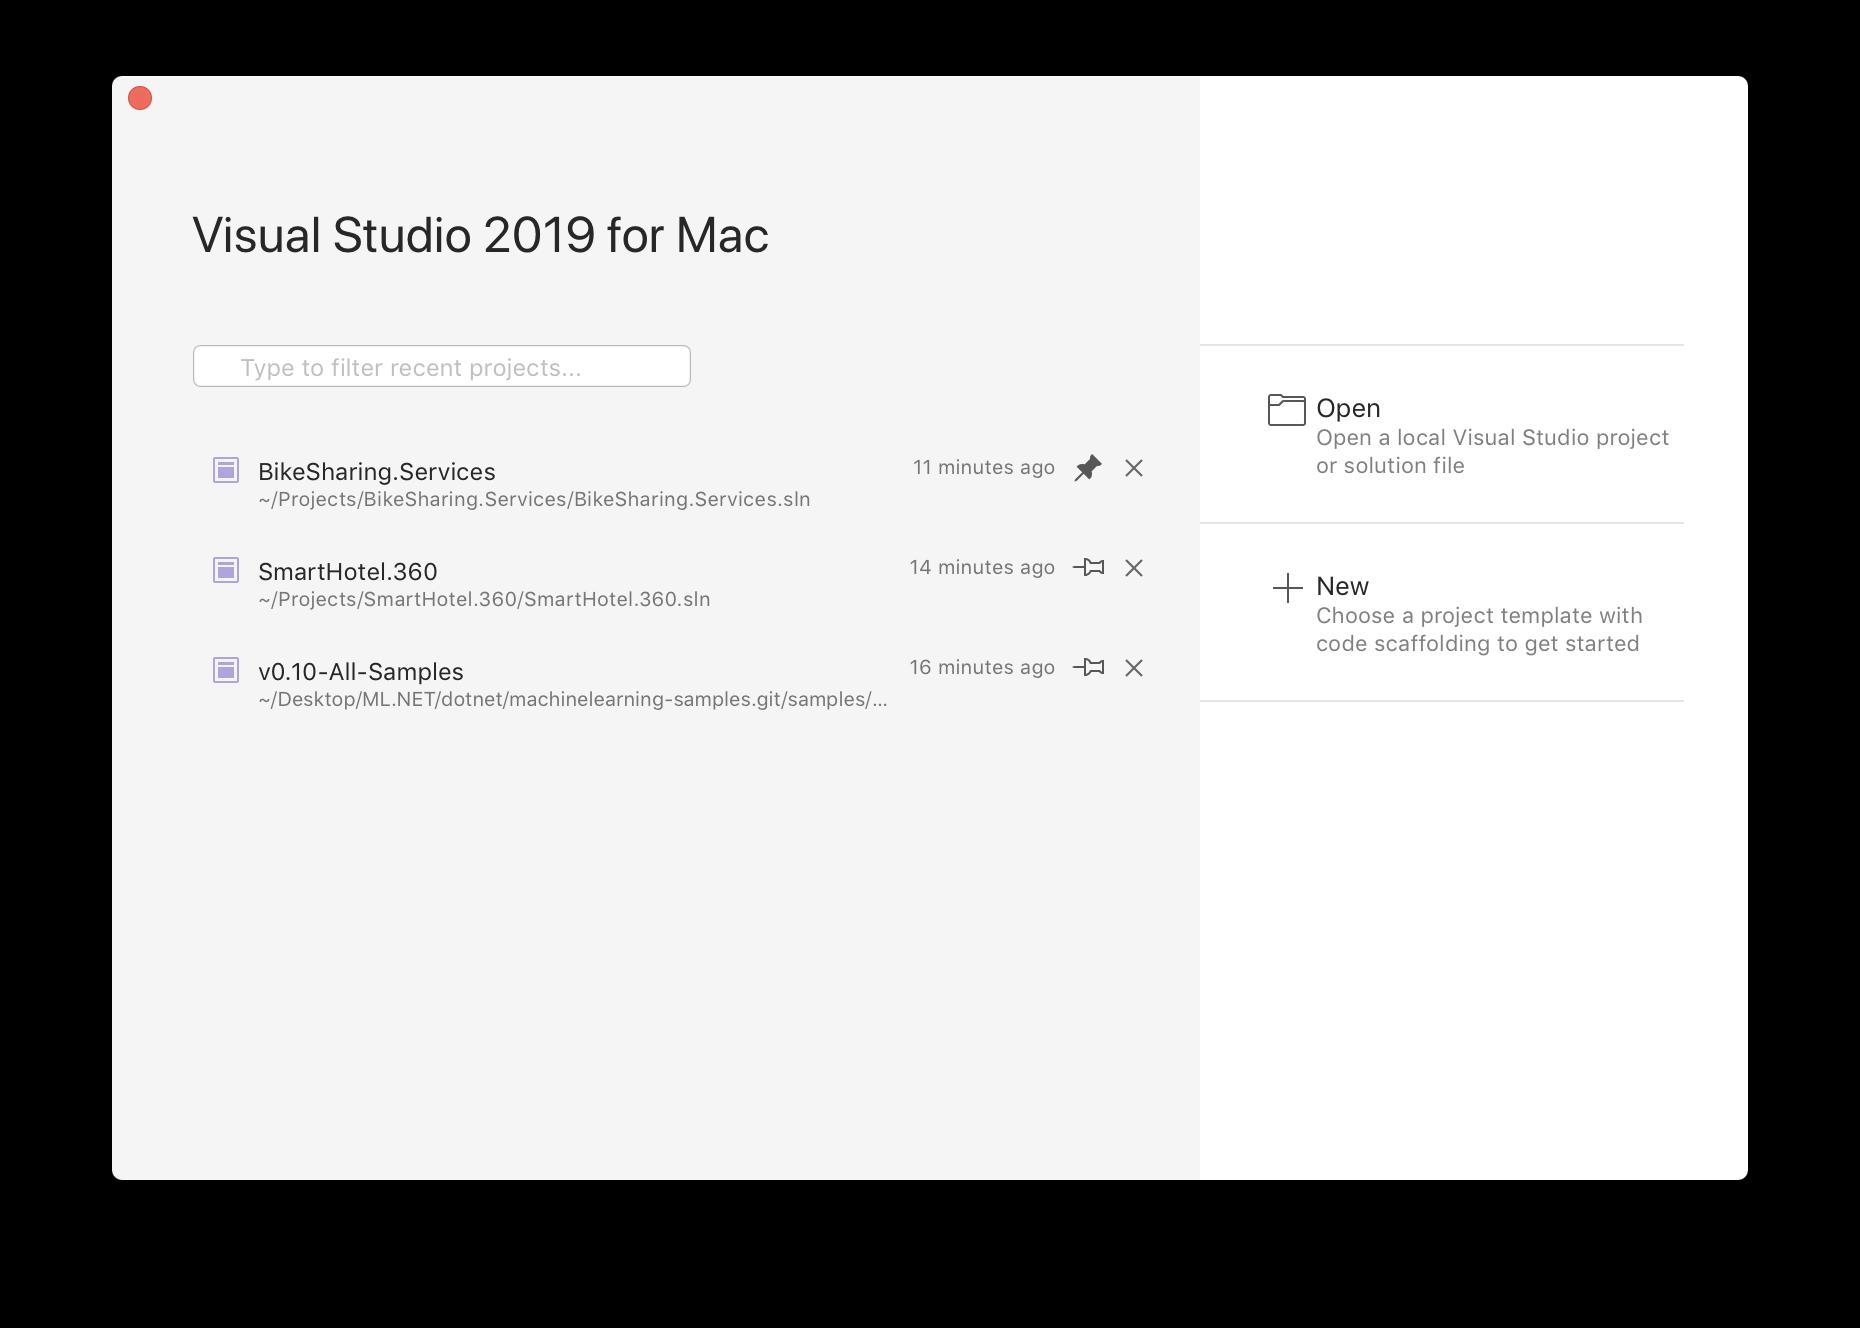 Выпущена Visual Studio 2019 / Блог компании JUG Ru Group / Хабр